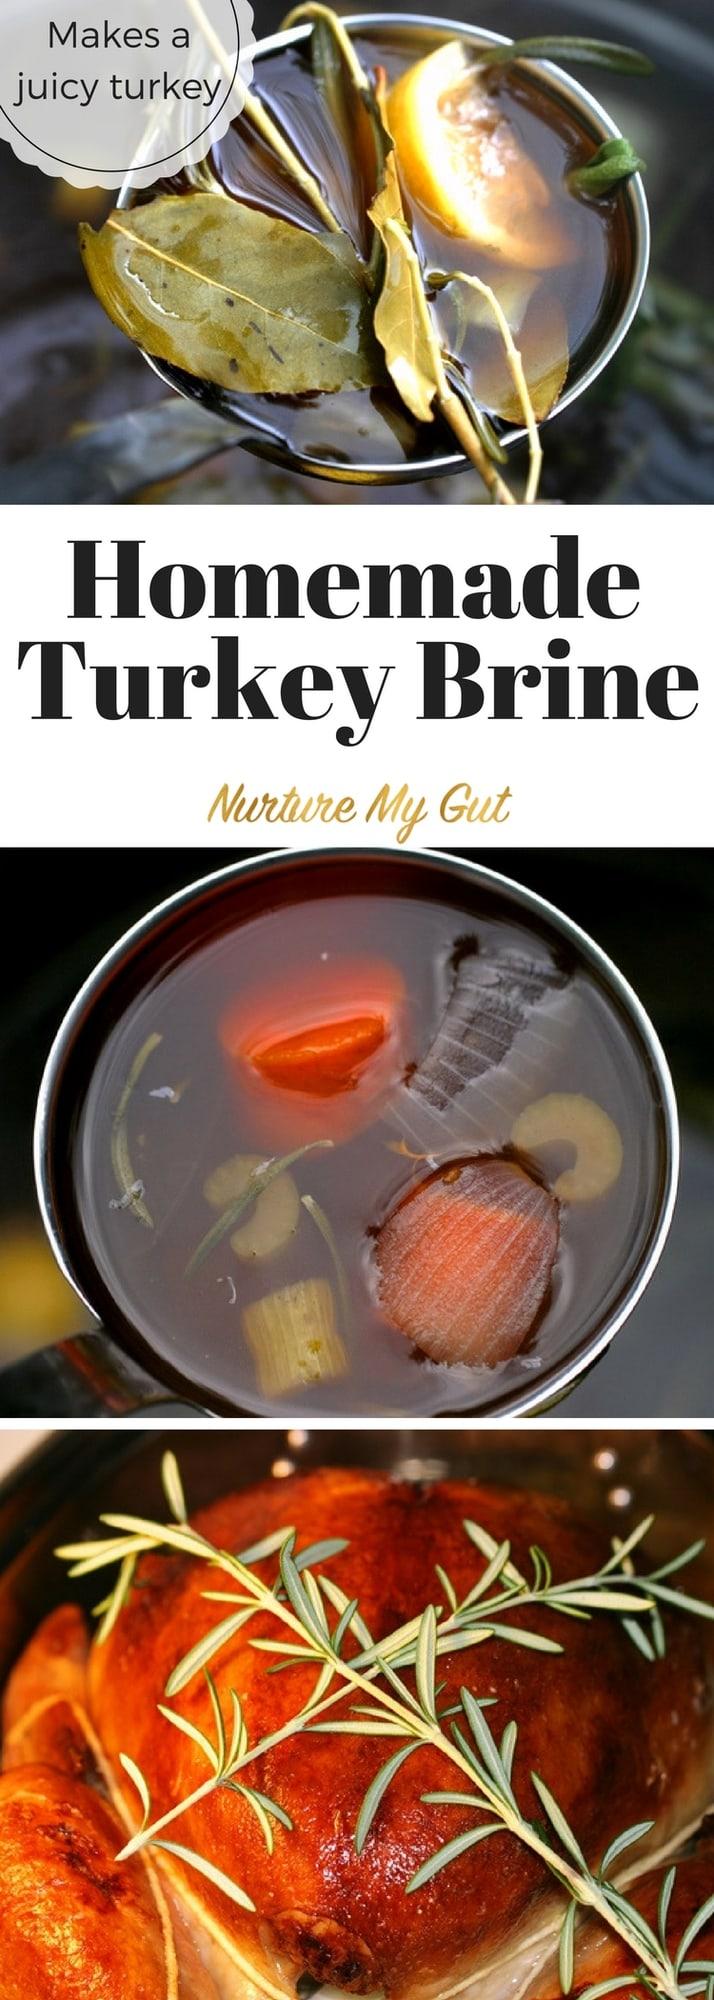 easy homemade turkey brine